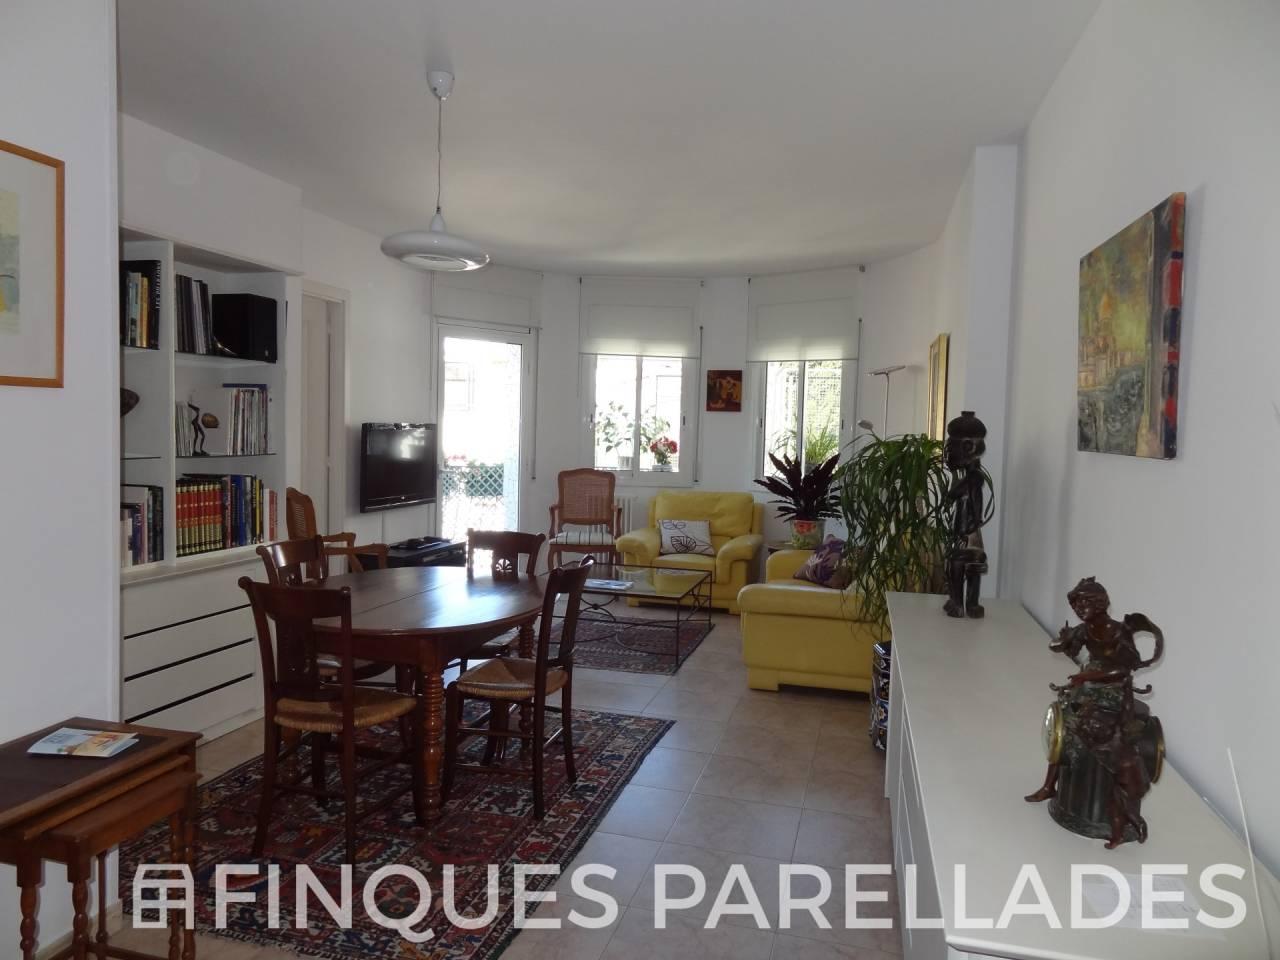 Soleado piso junto a playa de San Sebastian. Con plaza de  pk opcional.